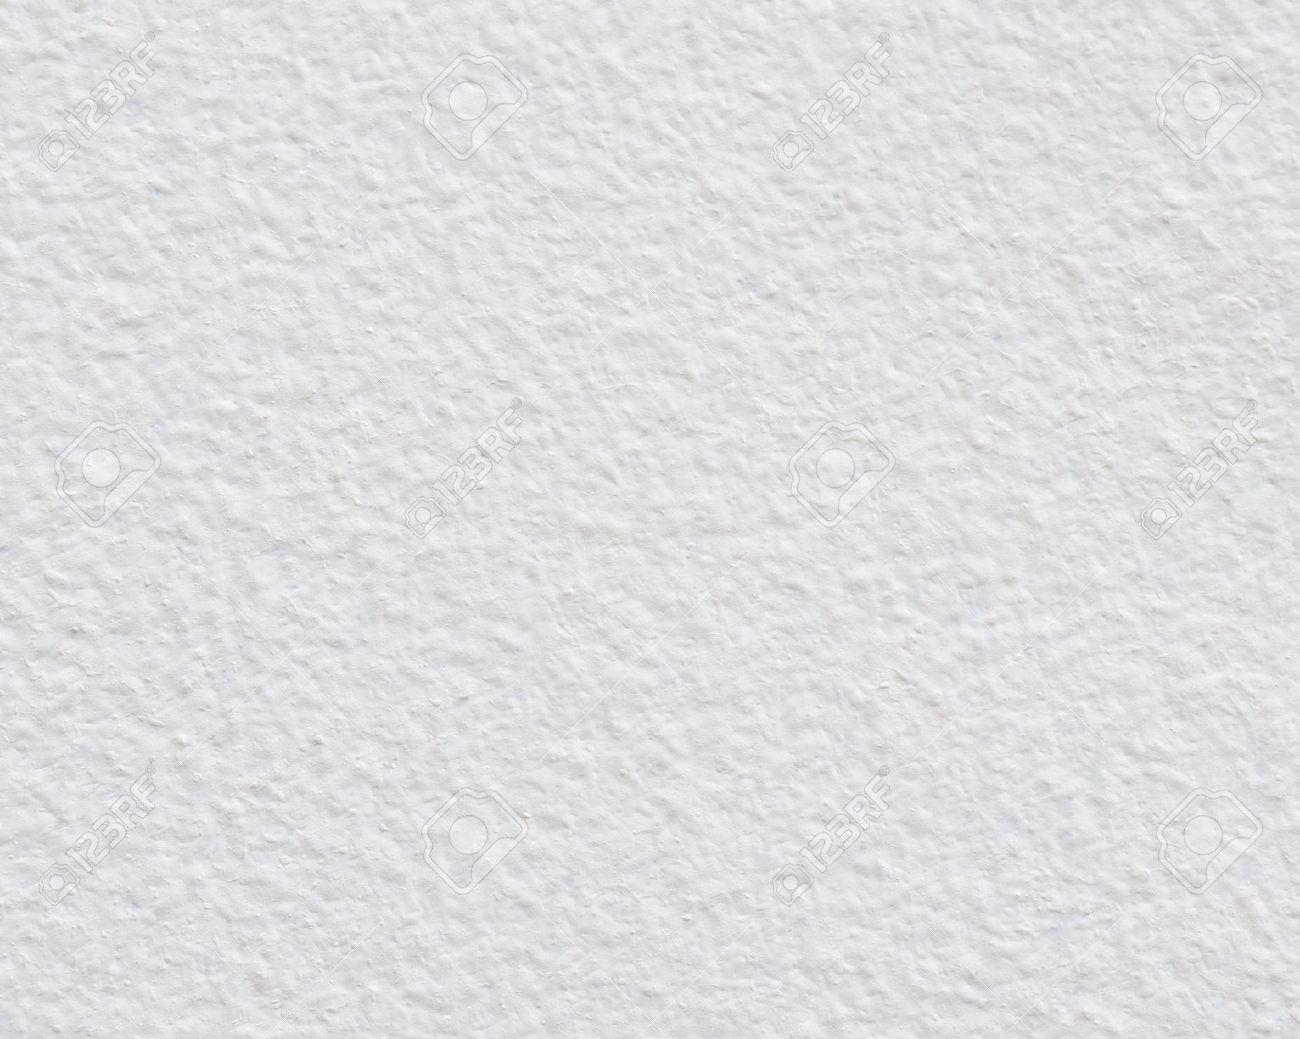 Closeup of a clean white wall texture - 58928238